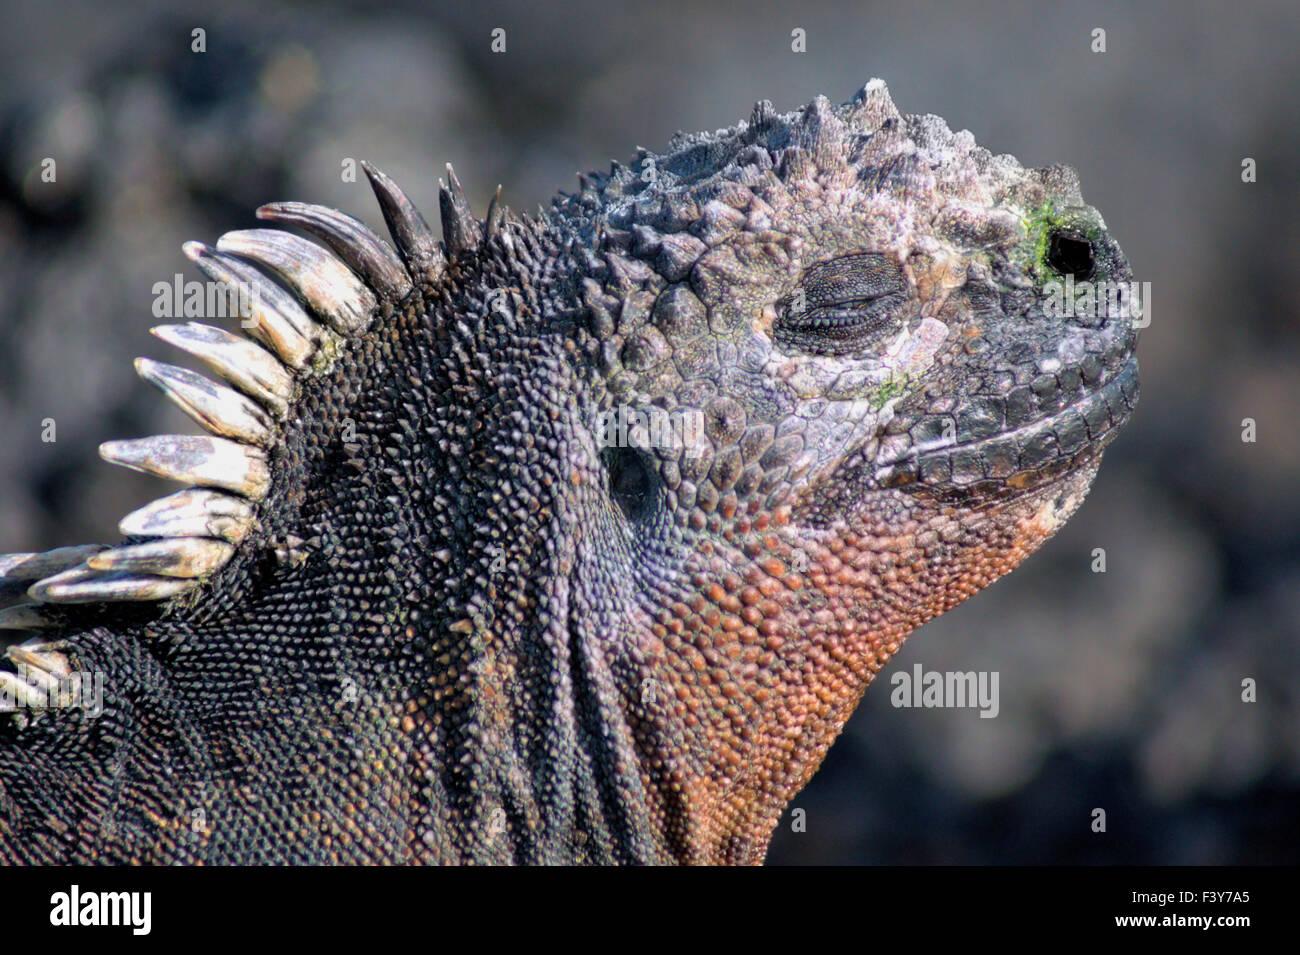 head of a sea-iguana, Galapagos - Stock Image